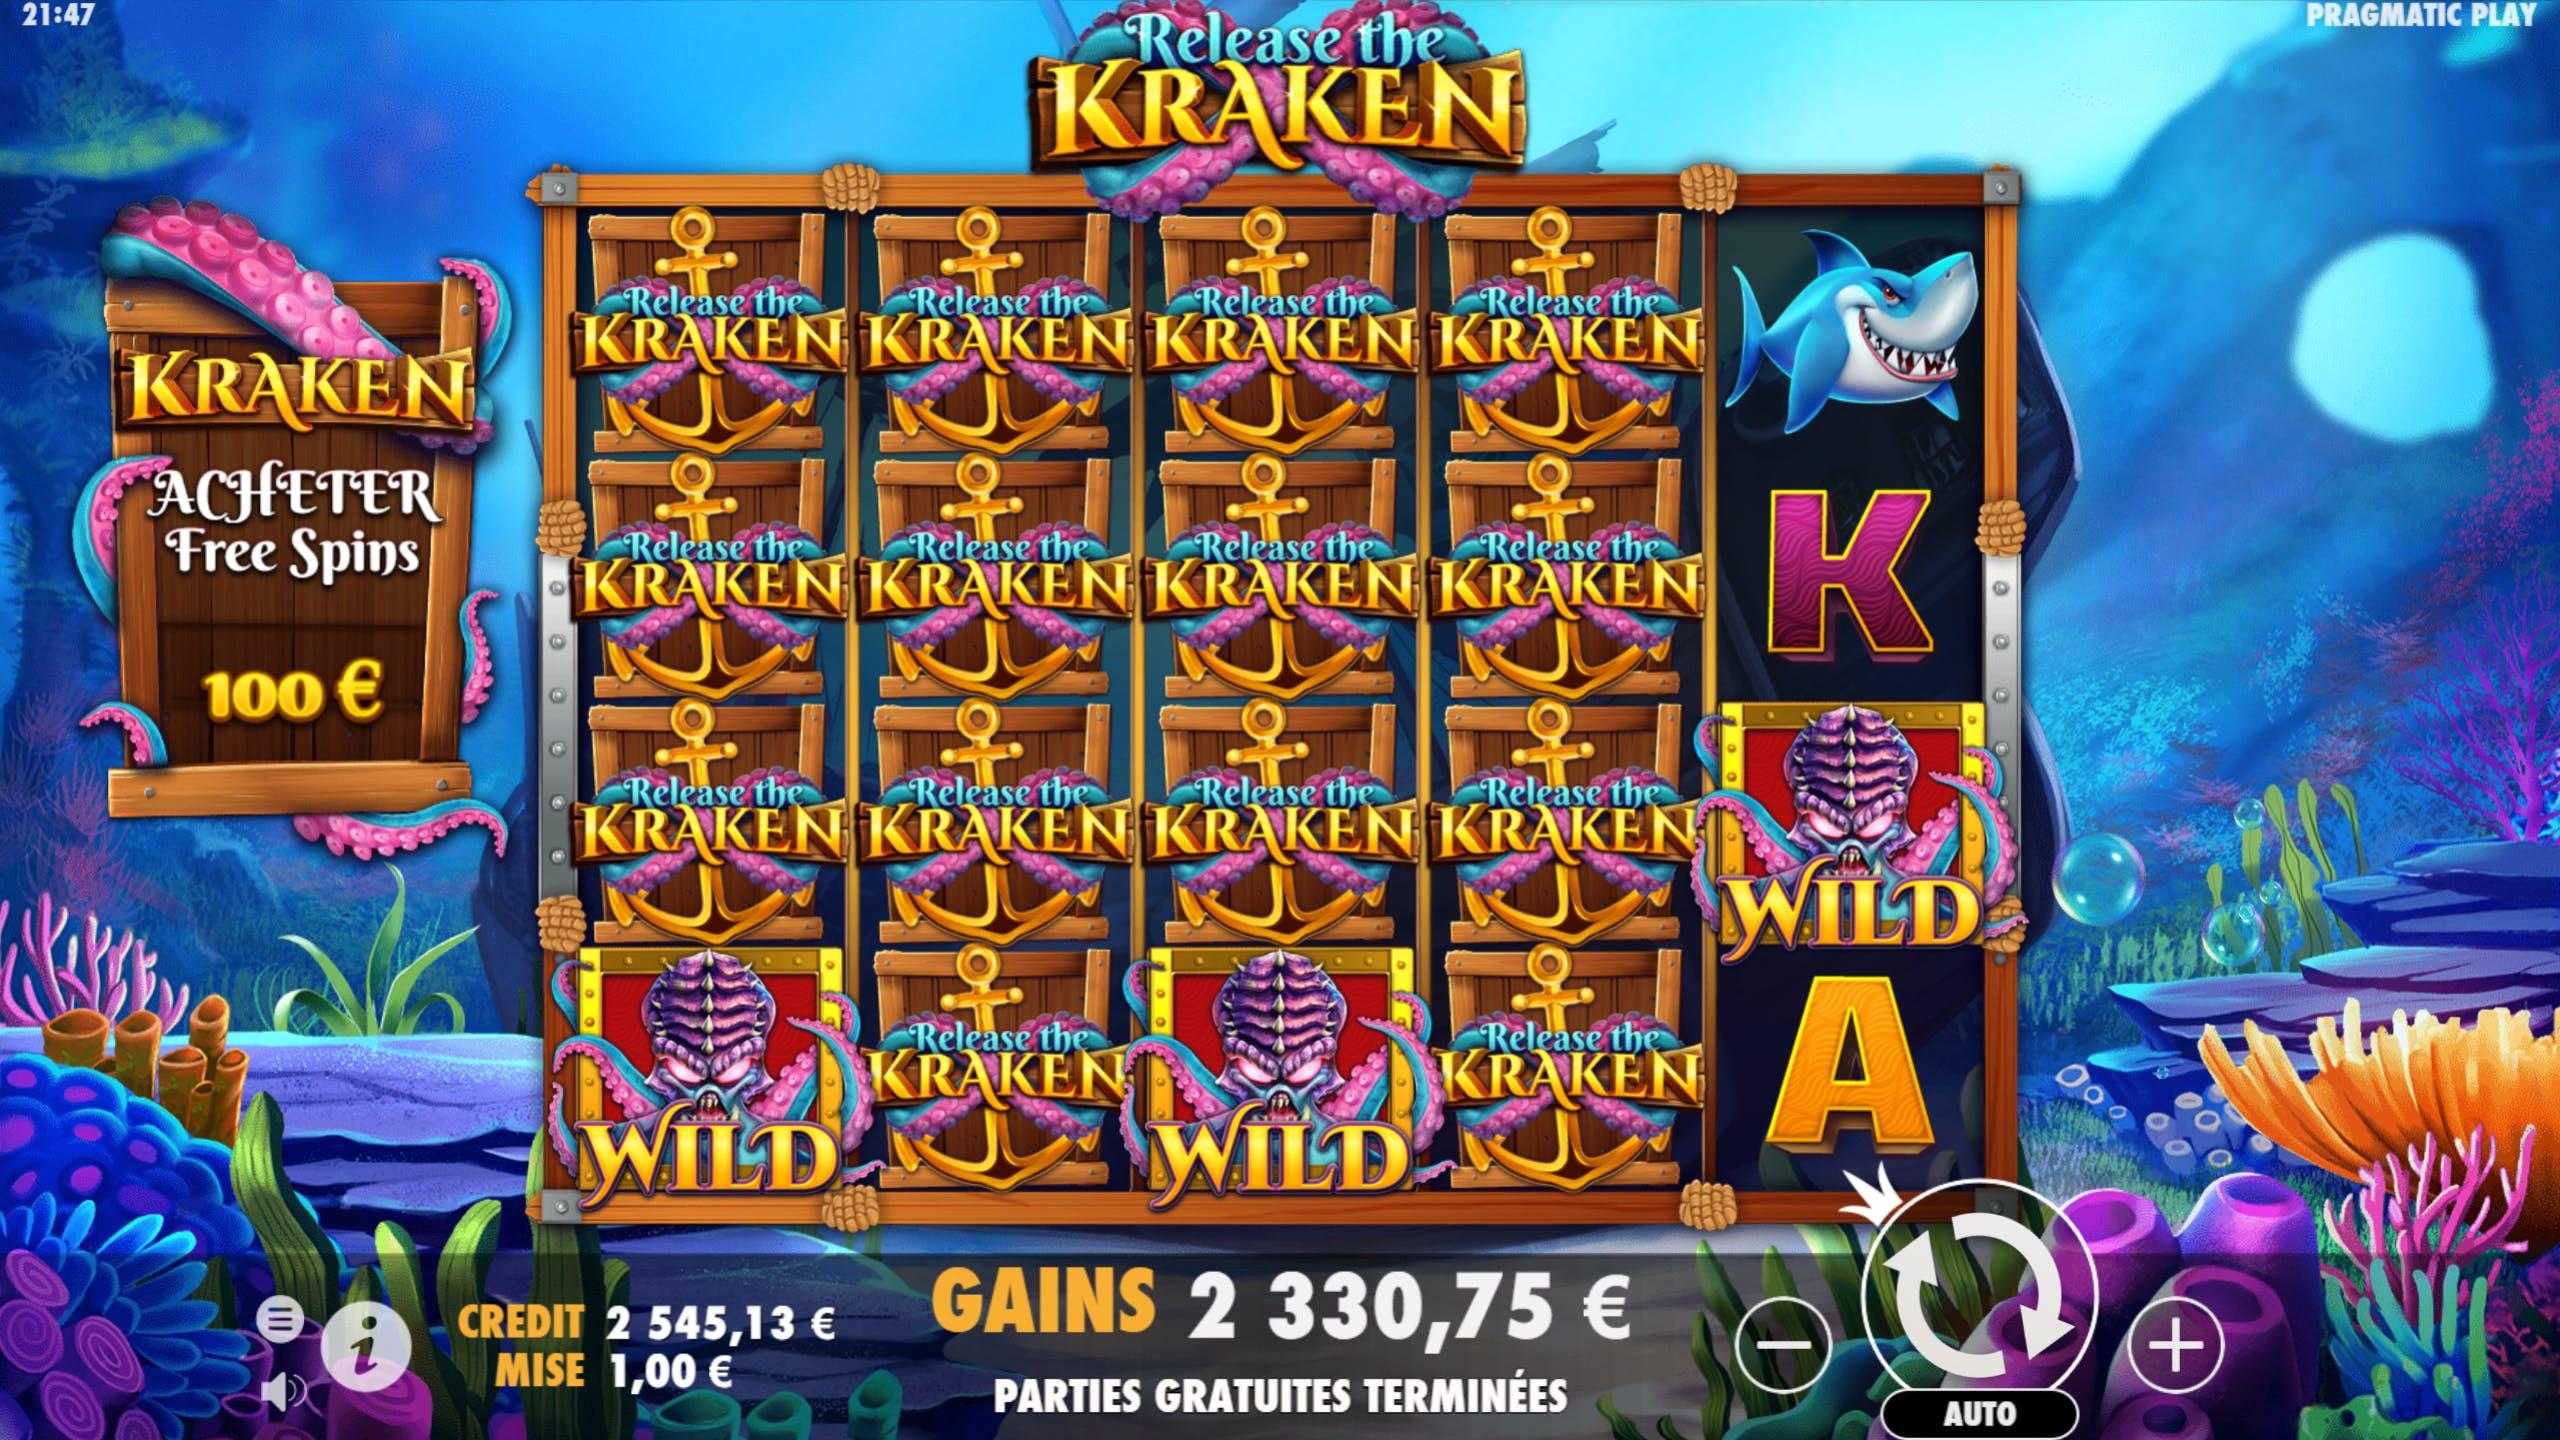 Kraken Mega Big Win Full screen of Release the Kraken Symbols on Release the Kraken slot by Pragmatic Play